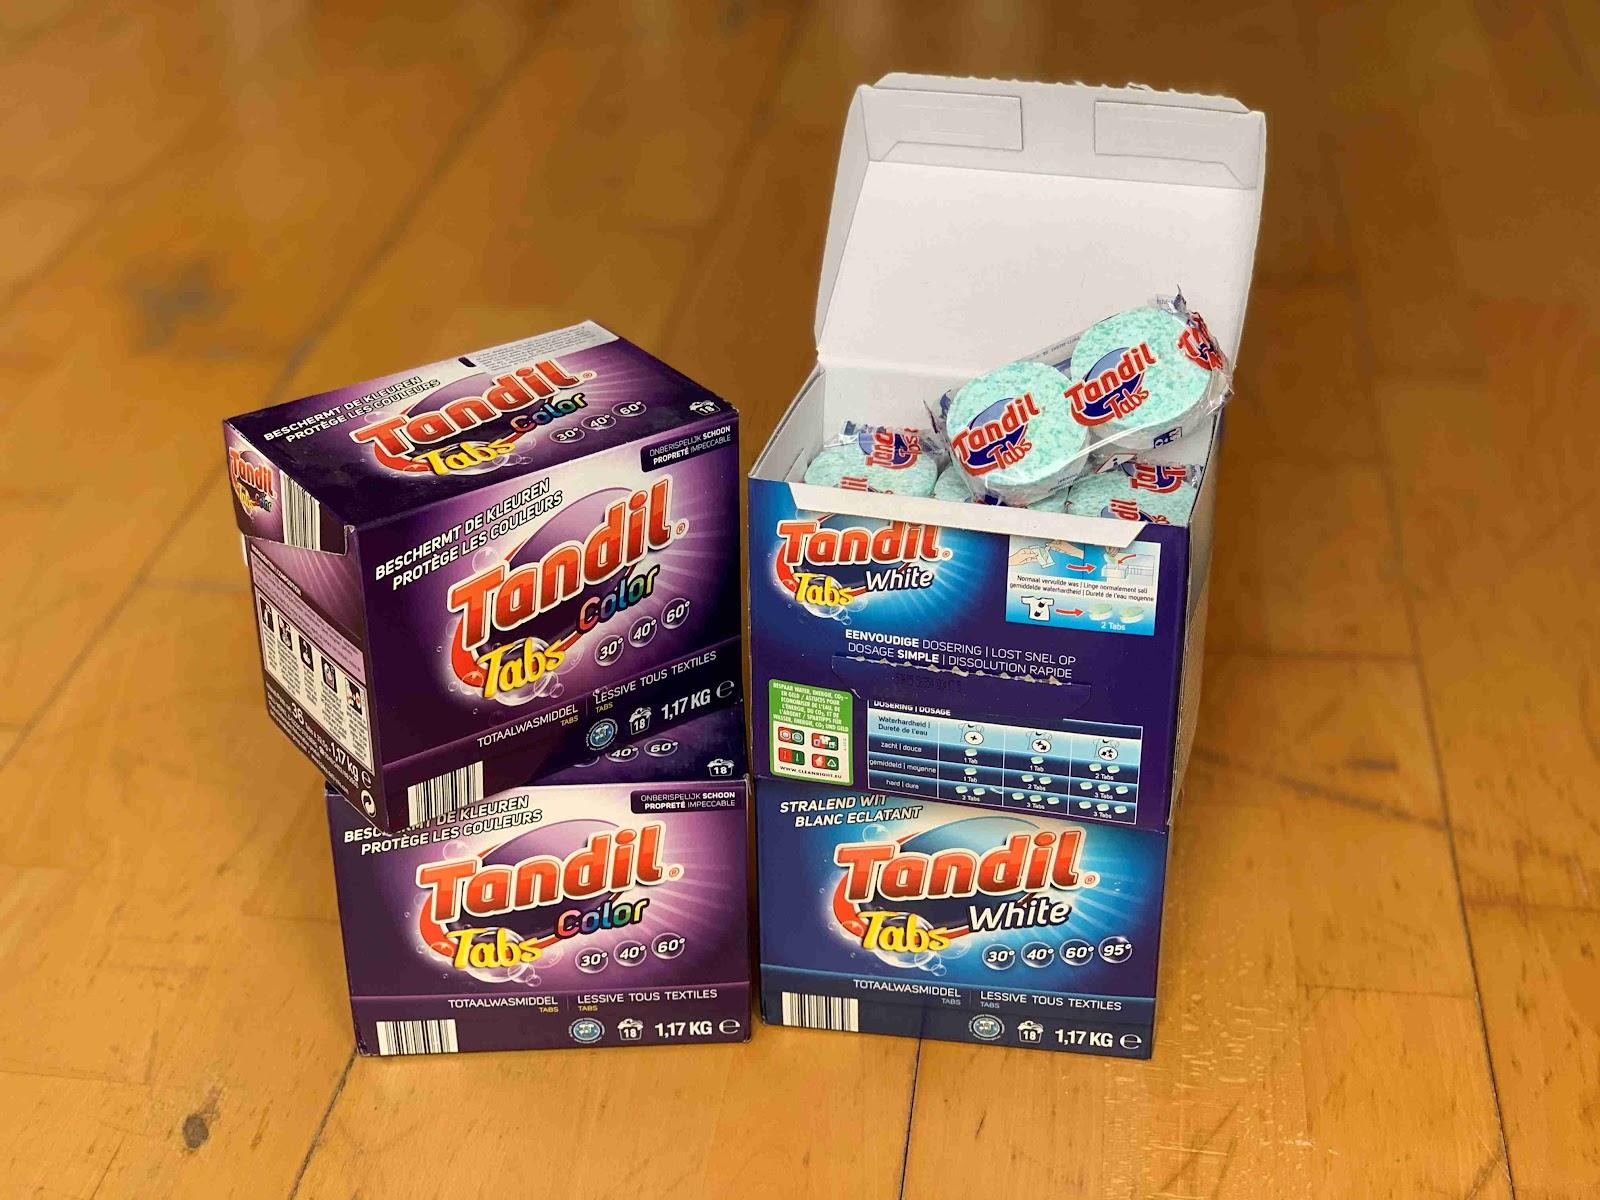 Recenze Drogerie-Domu: Tandil tablety do pračky